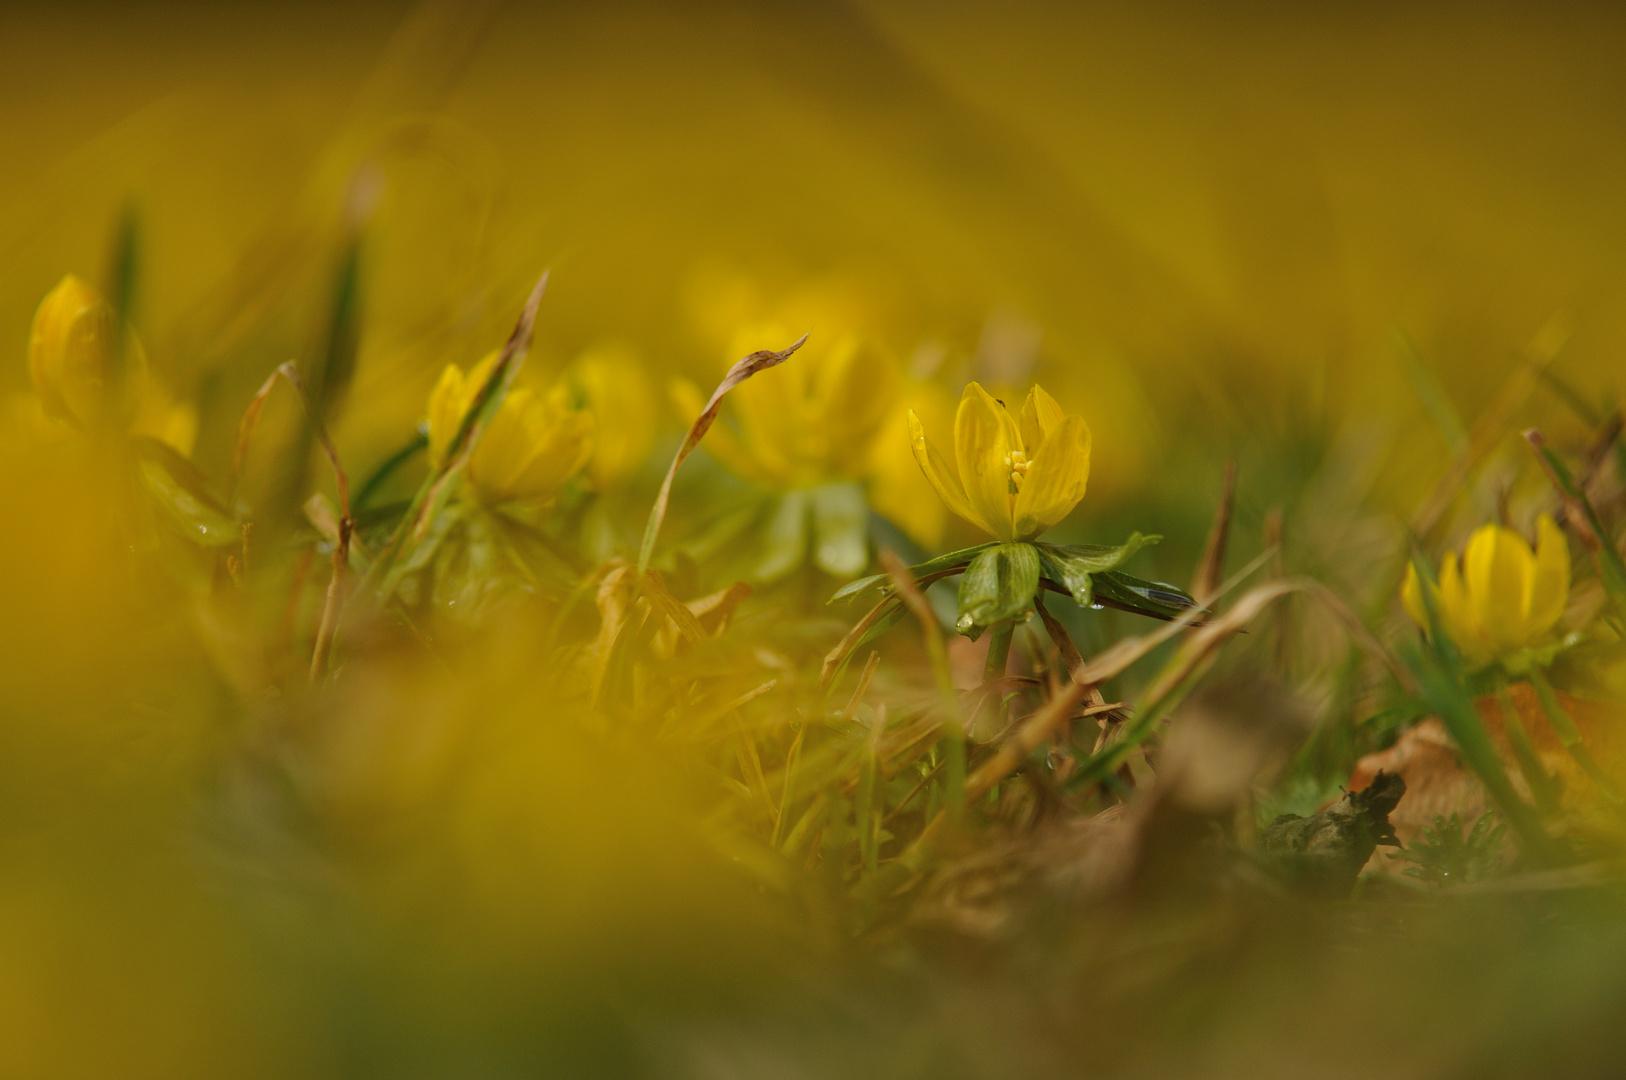 Der Frühling grüßt in Gelb